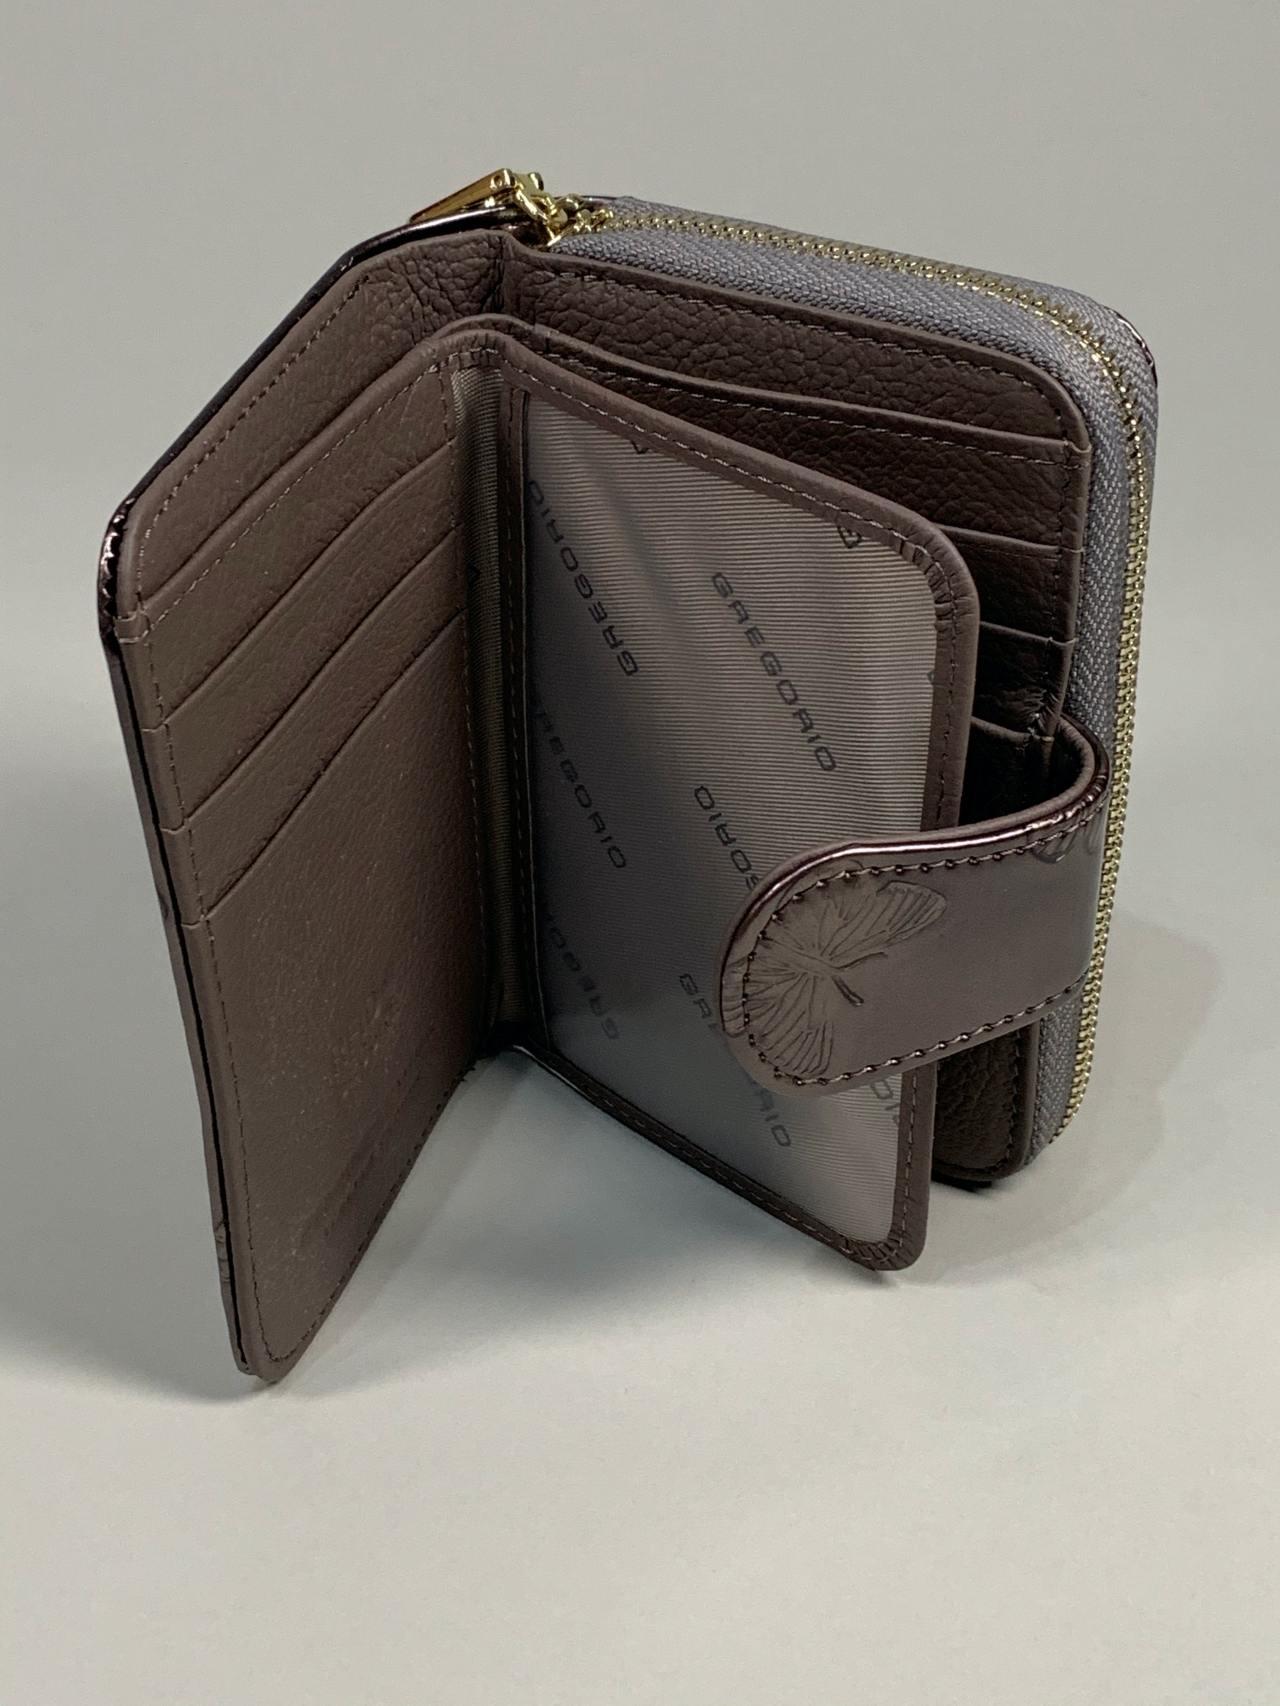 Kožená peněženka Gregorio S šedá s motýly -05